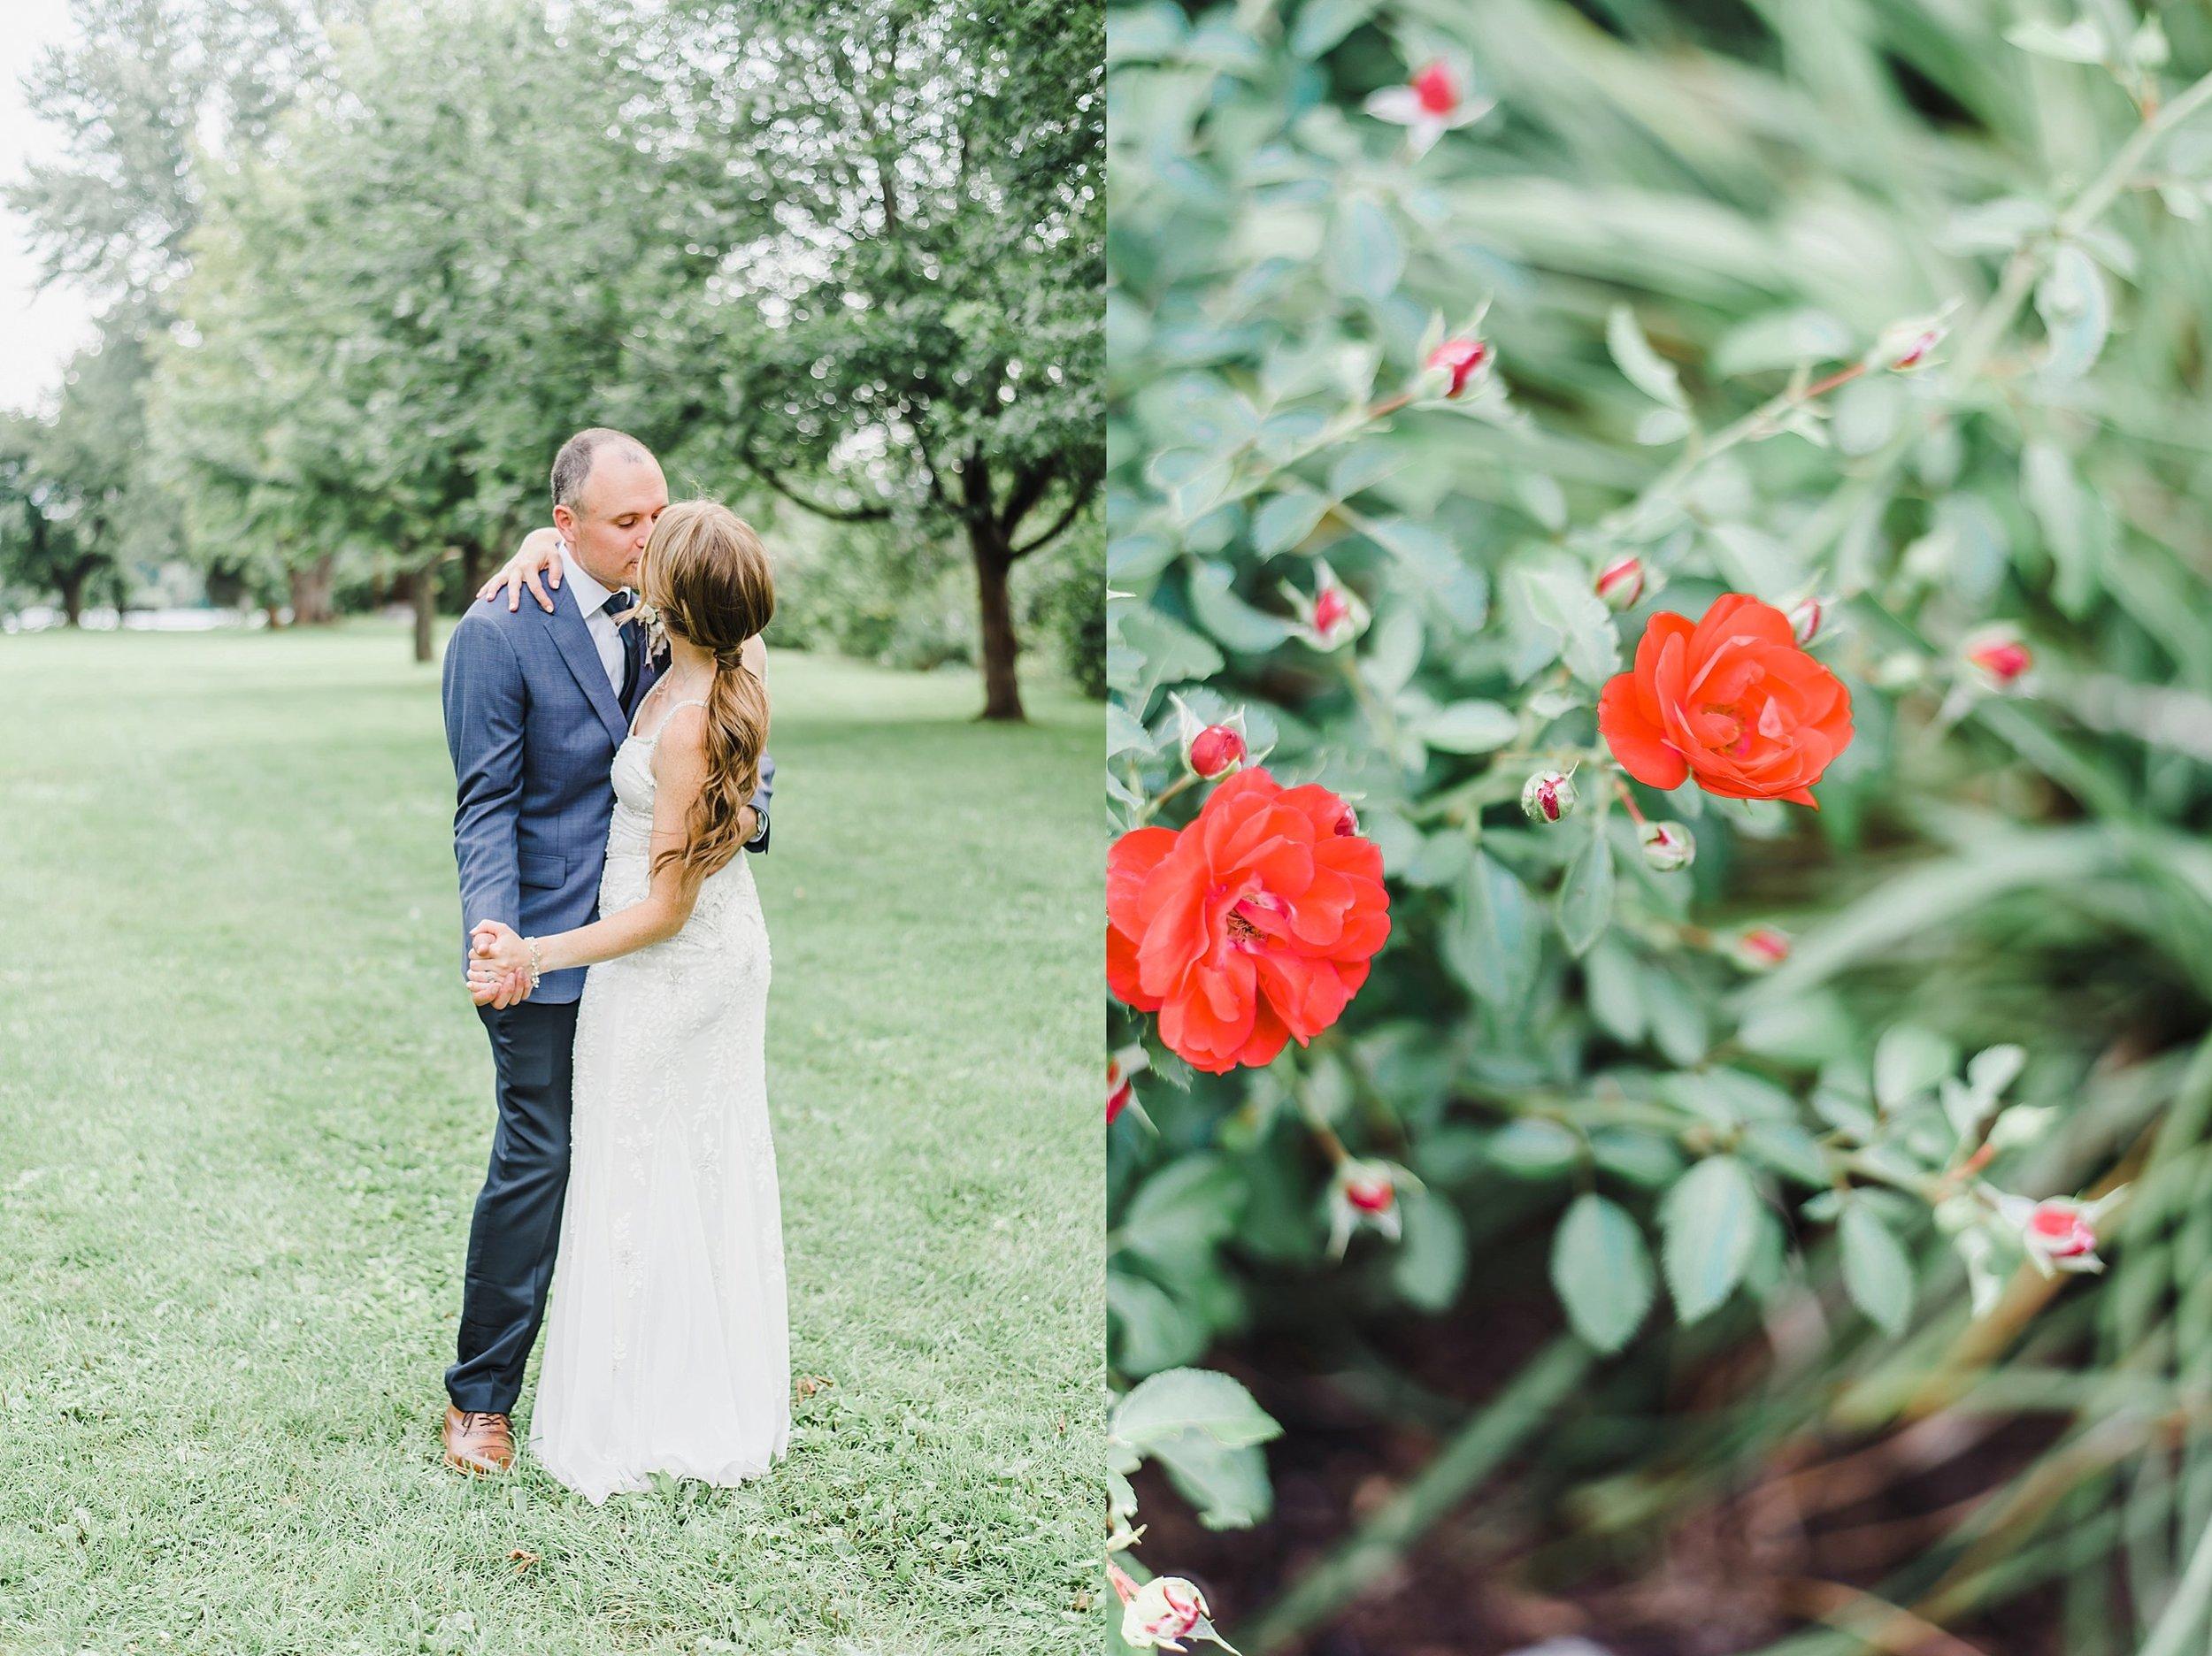 light airy indie fine art ottawa wedding photographer | Ali and Batoul Photography_0656.jpg